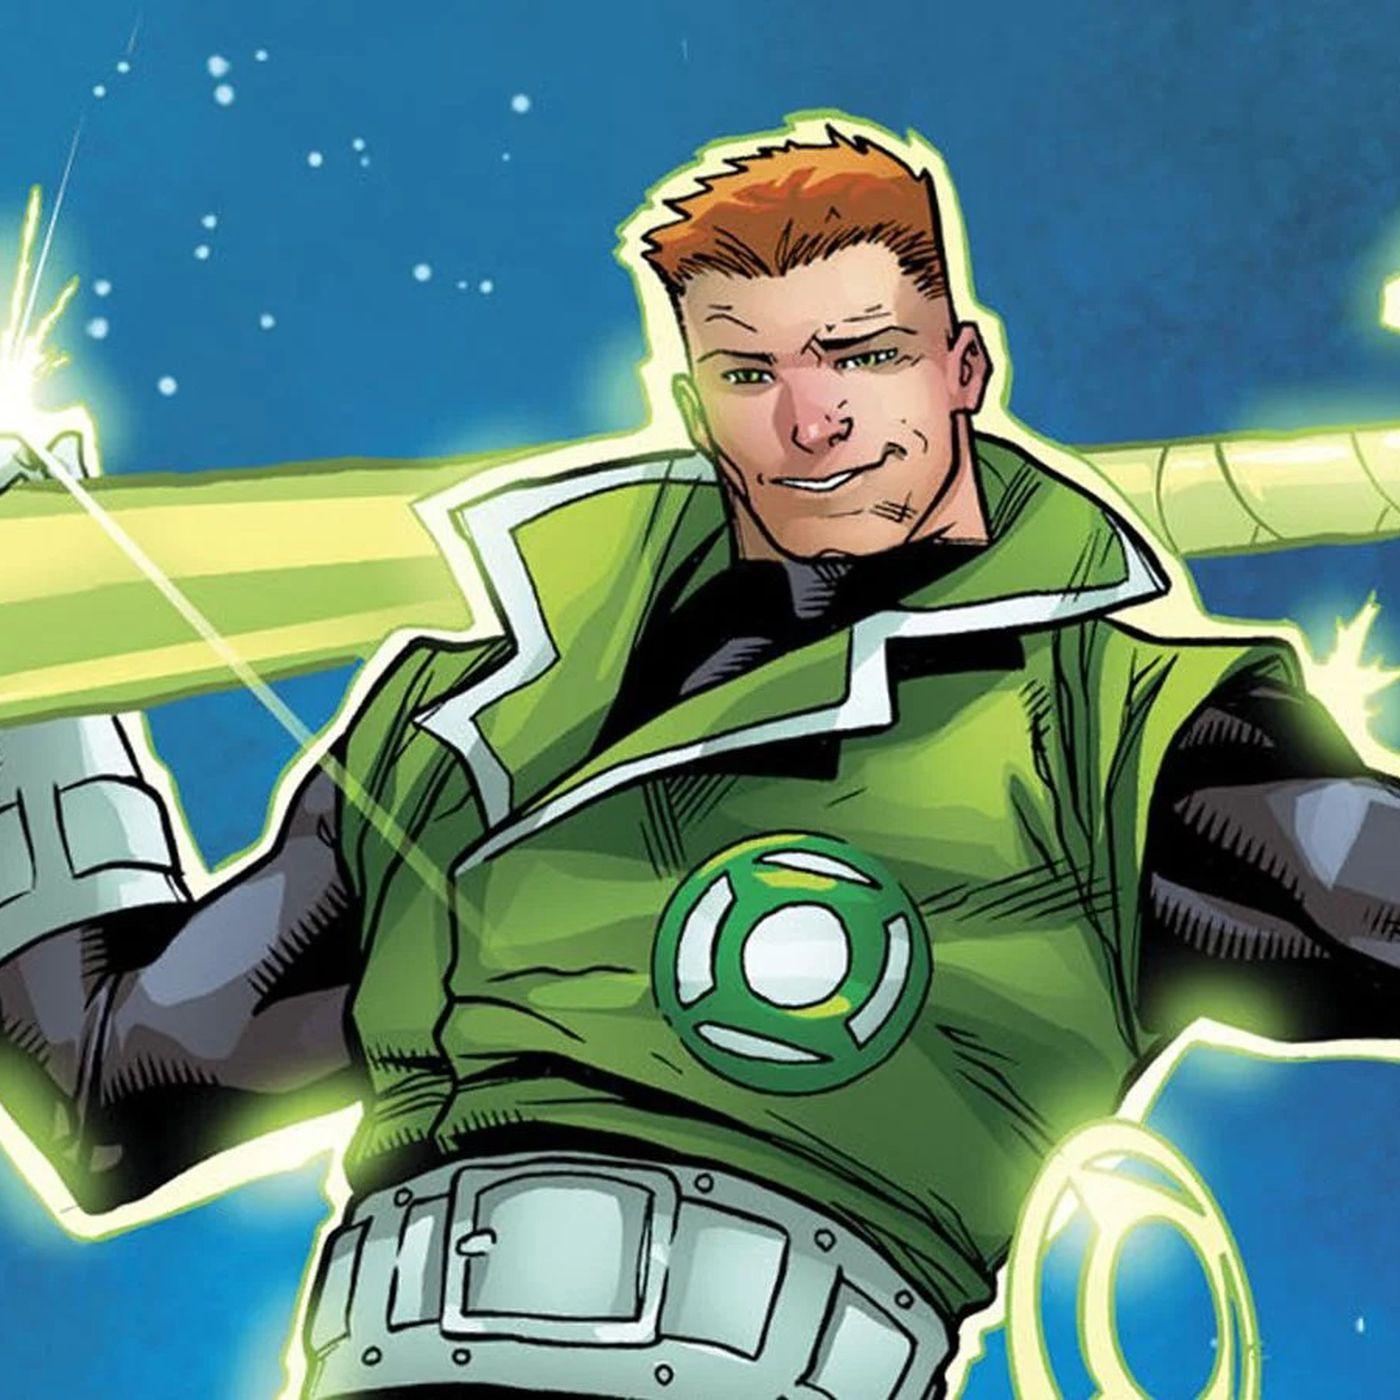 Green Lantern HBO Max show finds its Guy Gardner in Finn Wittrock - Polygon